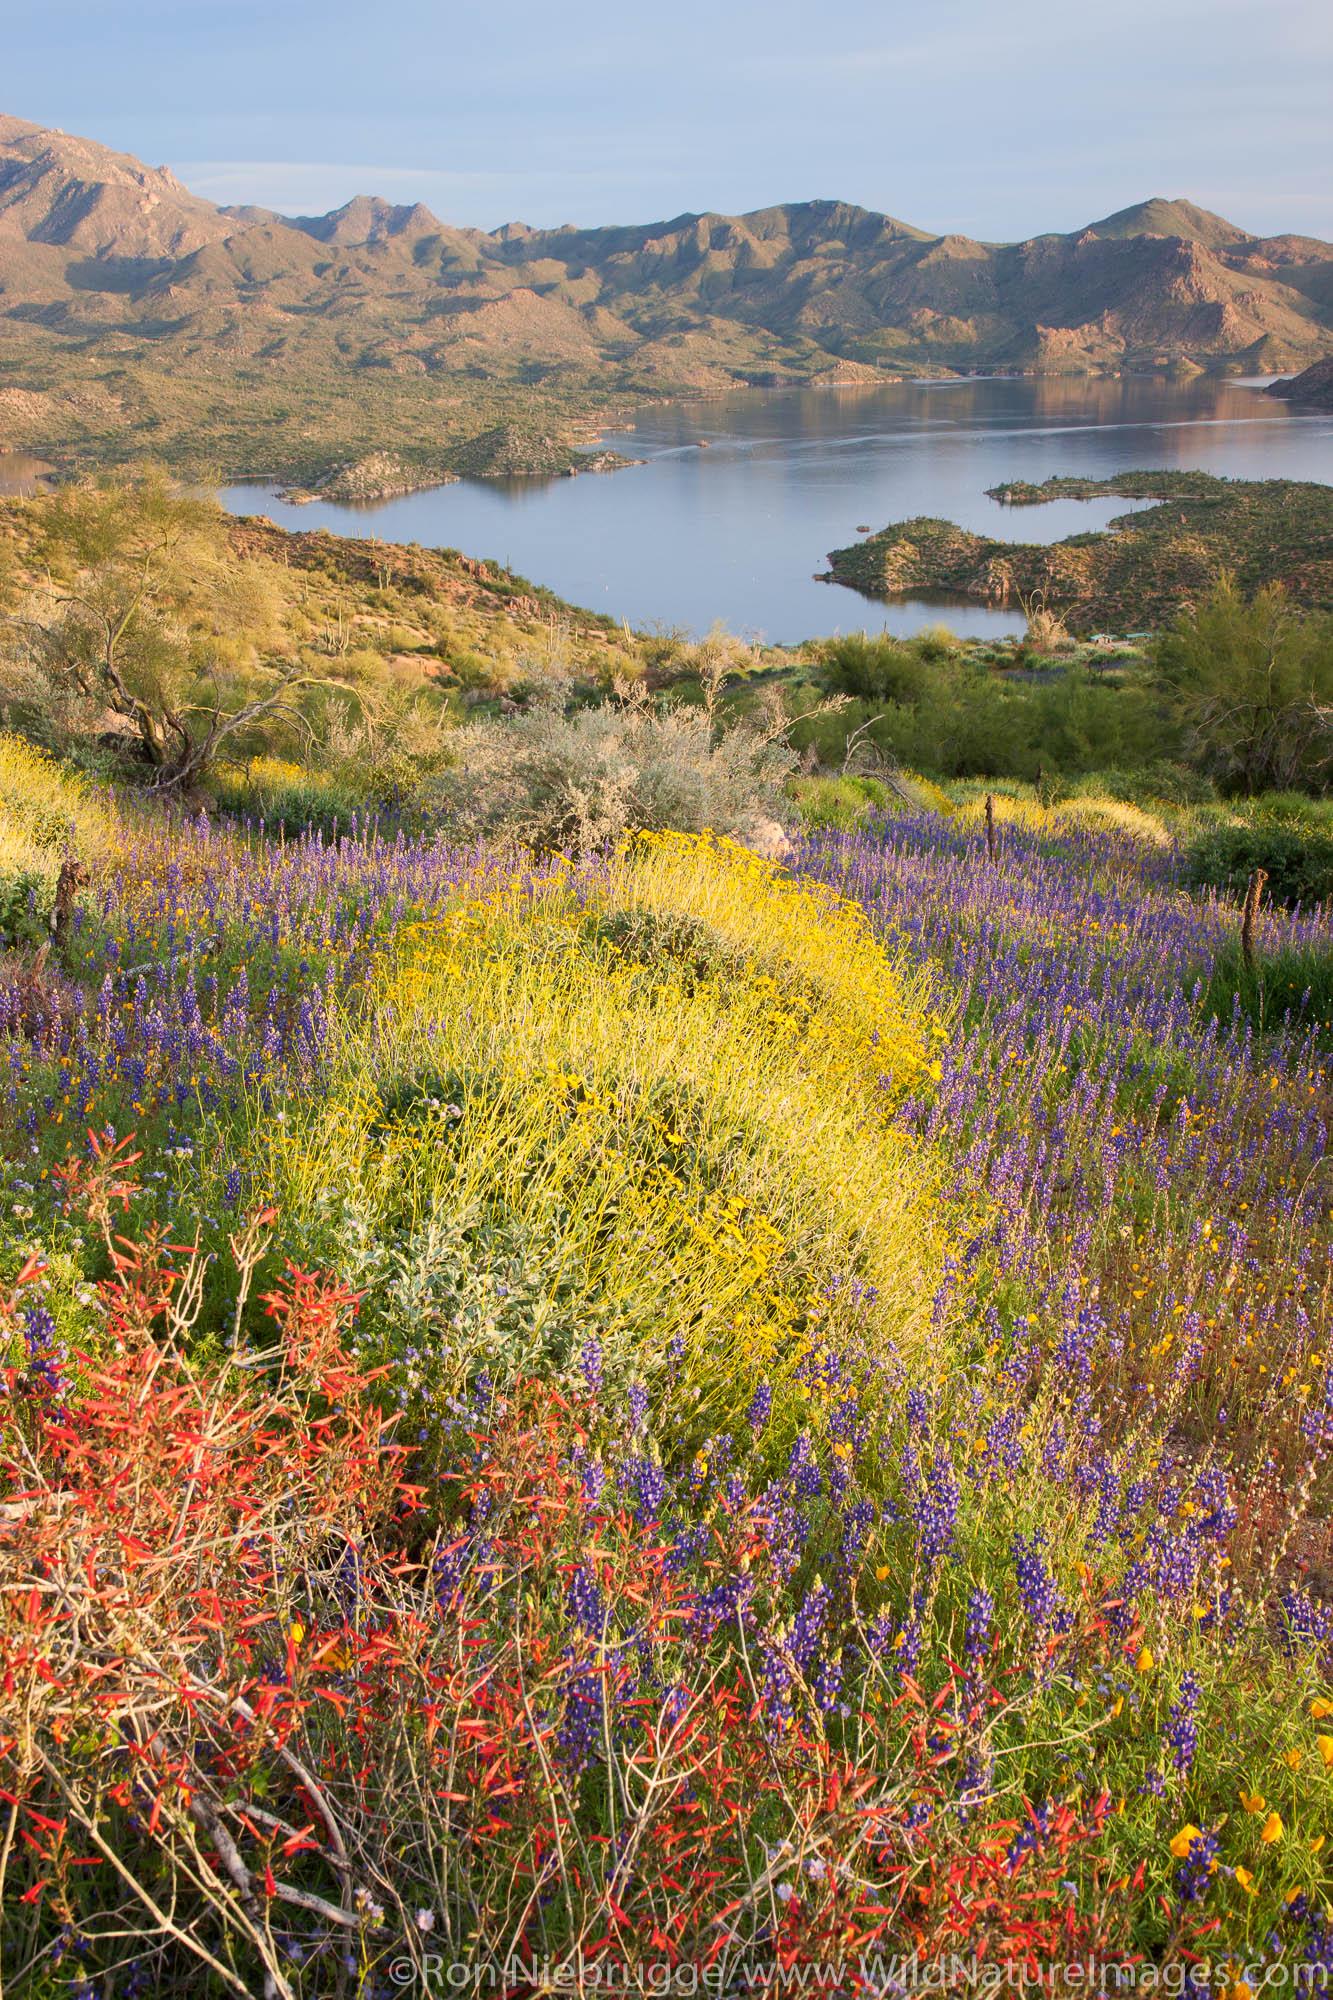 Wildflowers along Bartlett Lake, Tonto National Forest, near Phoenix, Arizona.